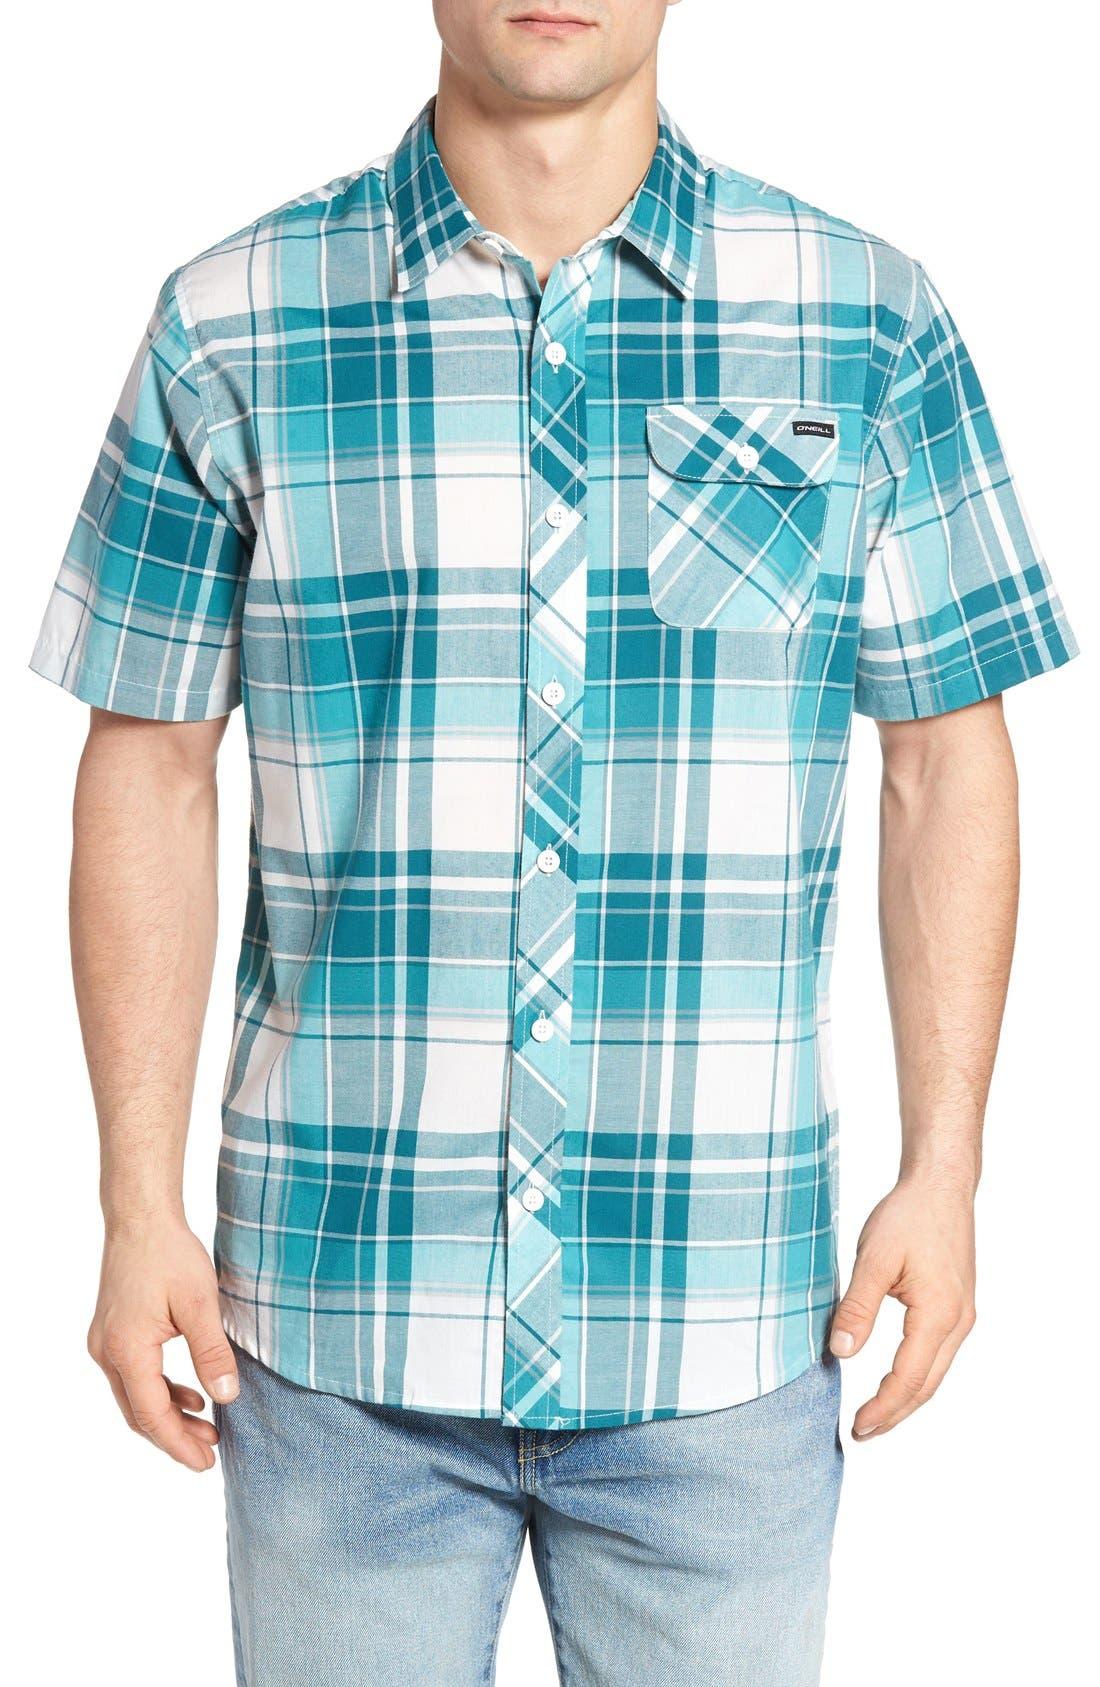 Main Image - O'Neill Plaid Woven Shirt